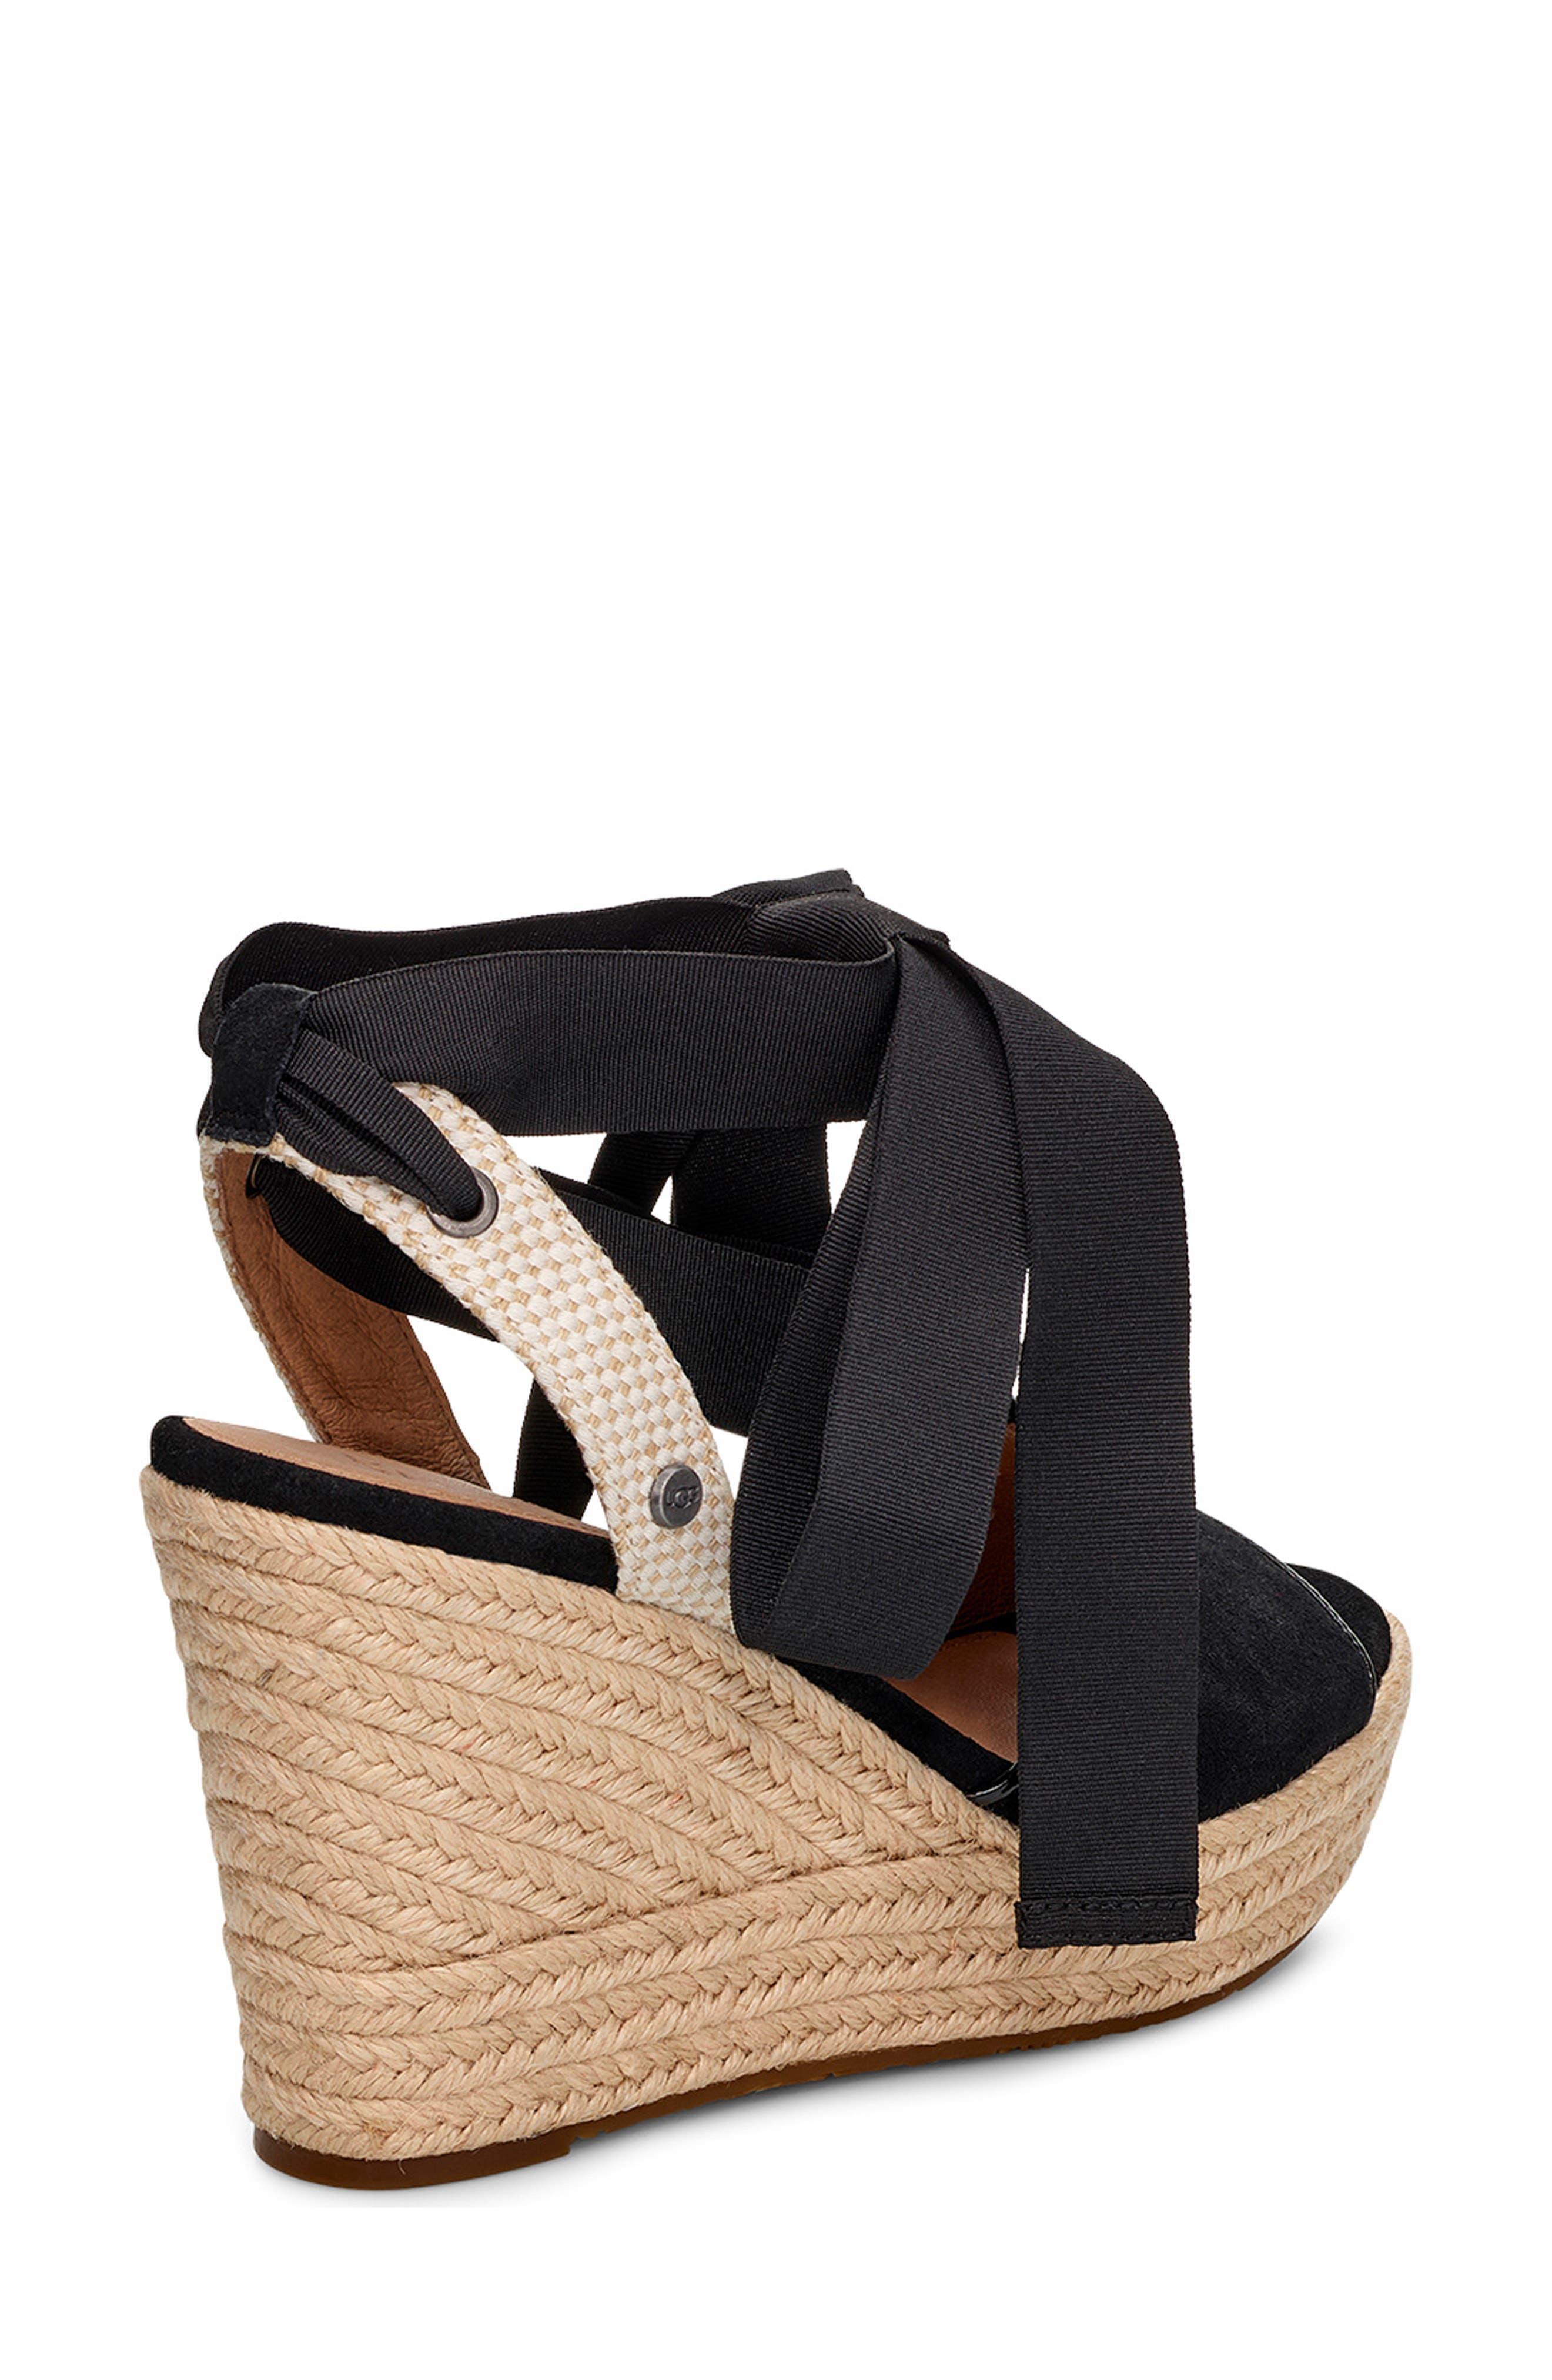 UGG<SUP>®</SUP>, Shiloh Wedge Sandal, Alternate thumbnail 2, color, BLACK FABRIC